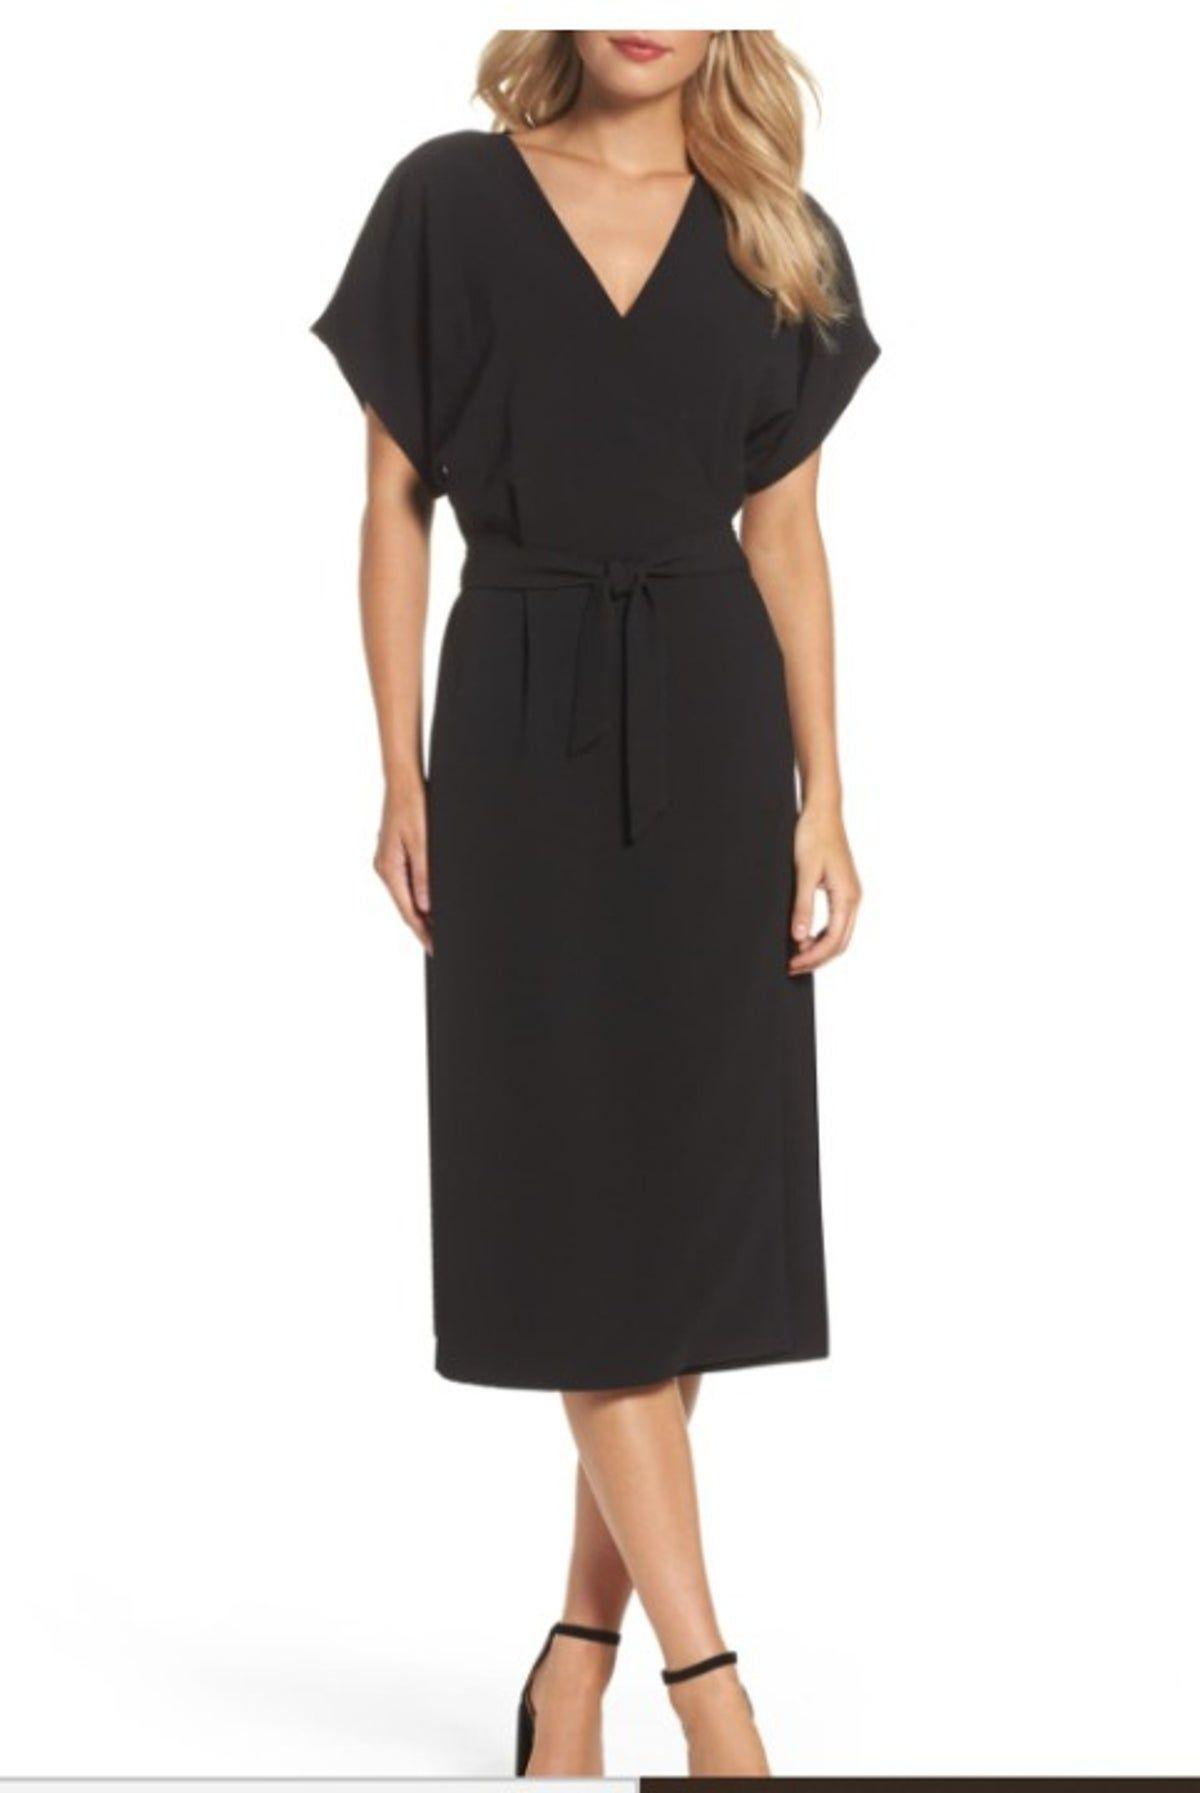 felicity & coco} black wrap dress sourcemercarius #black